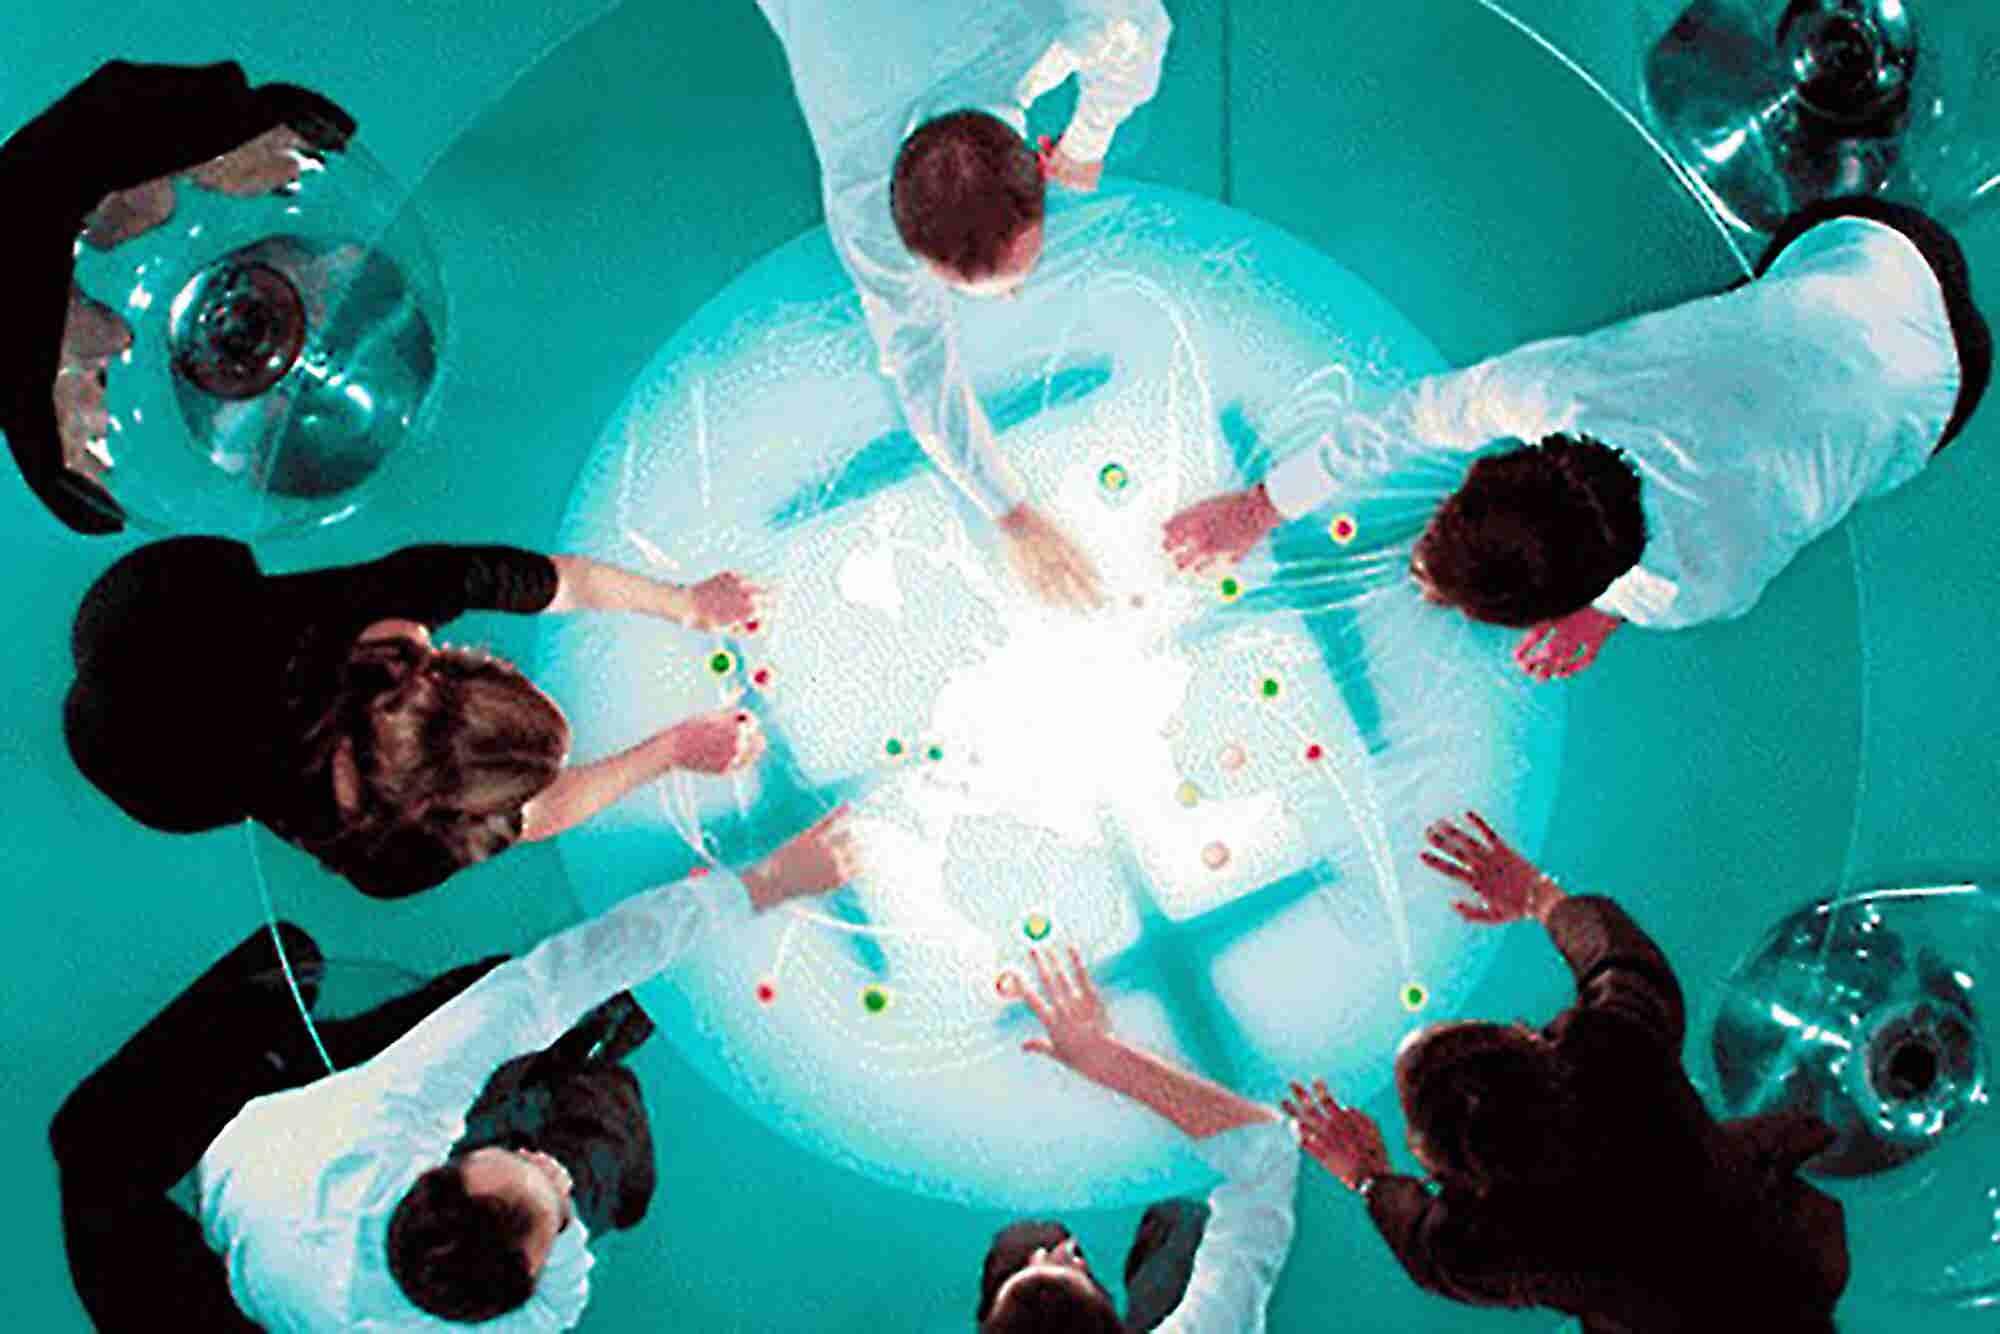 Wazify Your Business To Get Around Bottlenecks